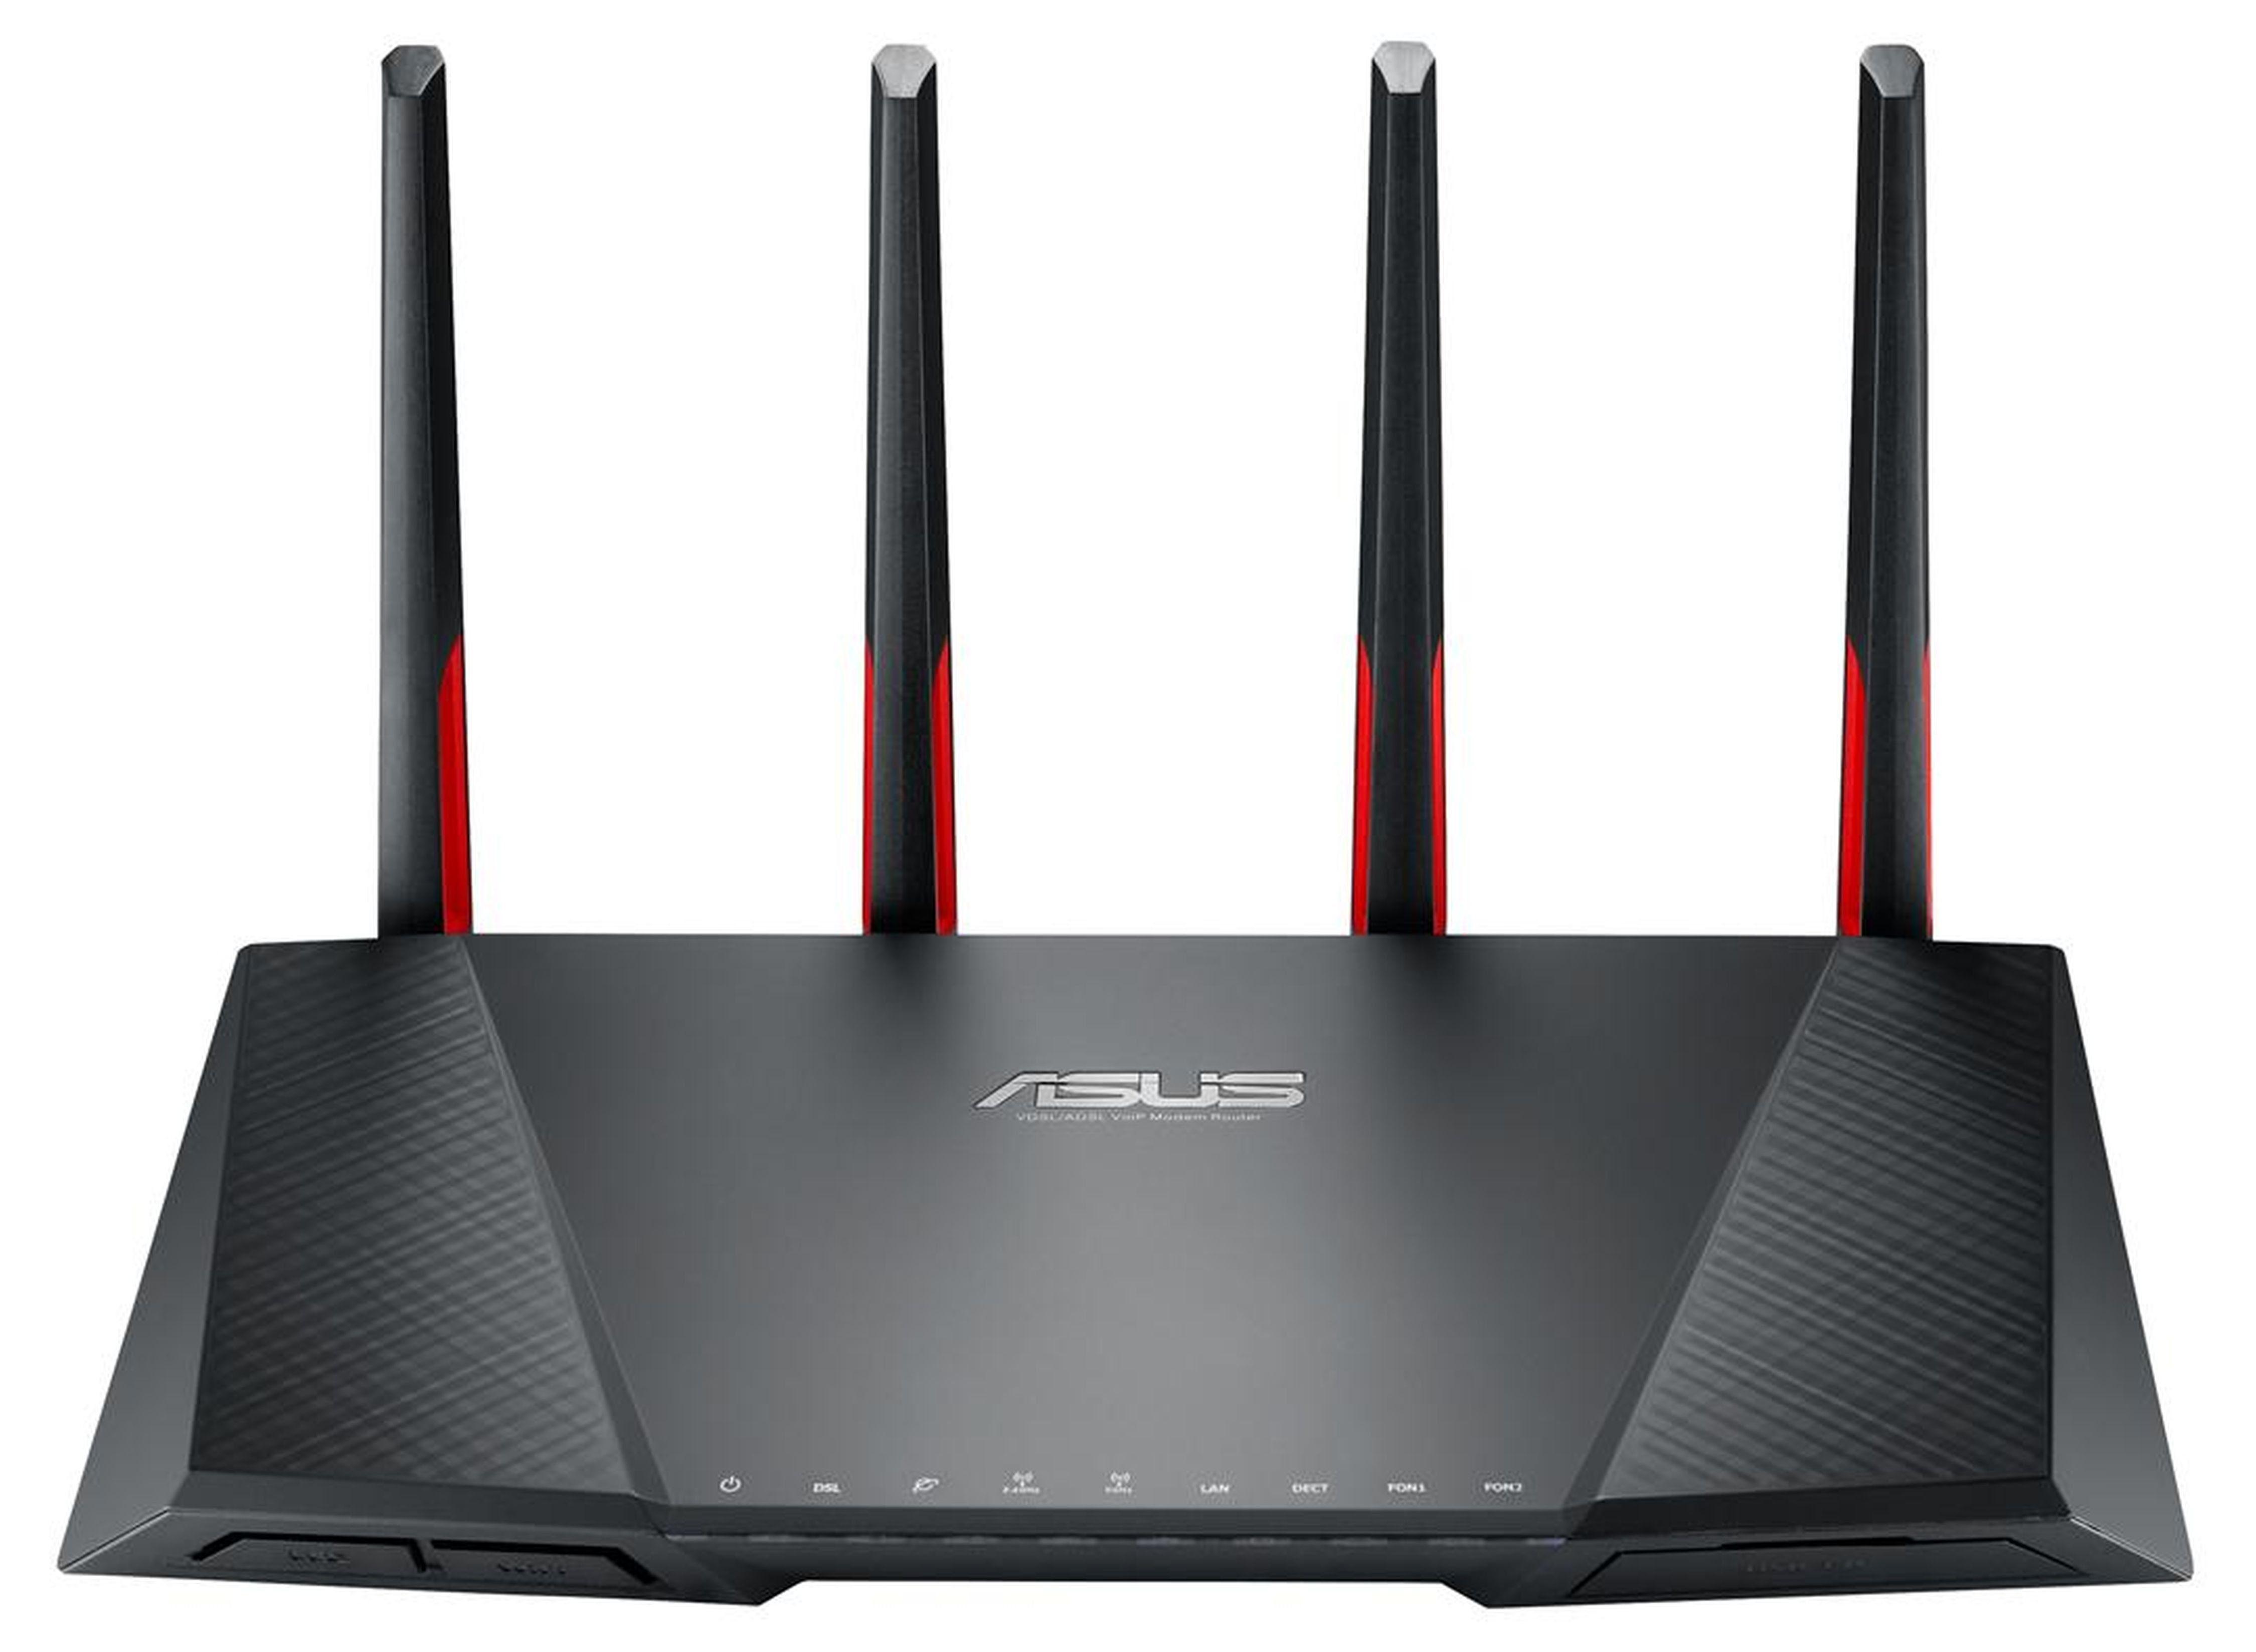 ASUS DSL-AC68VG »VOIP«